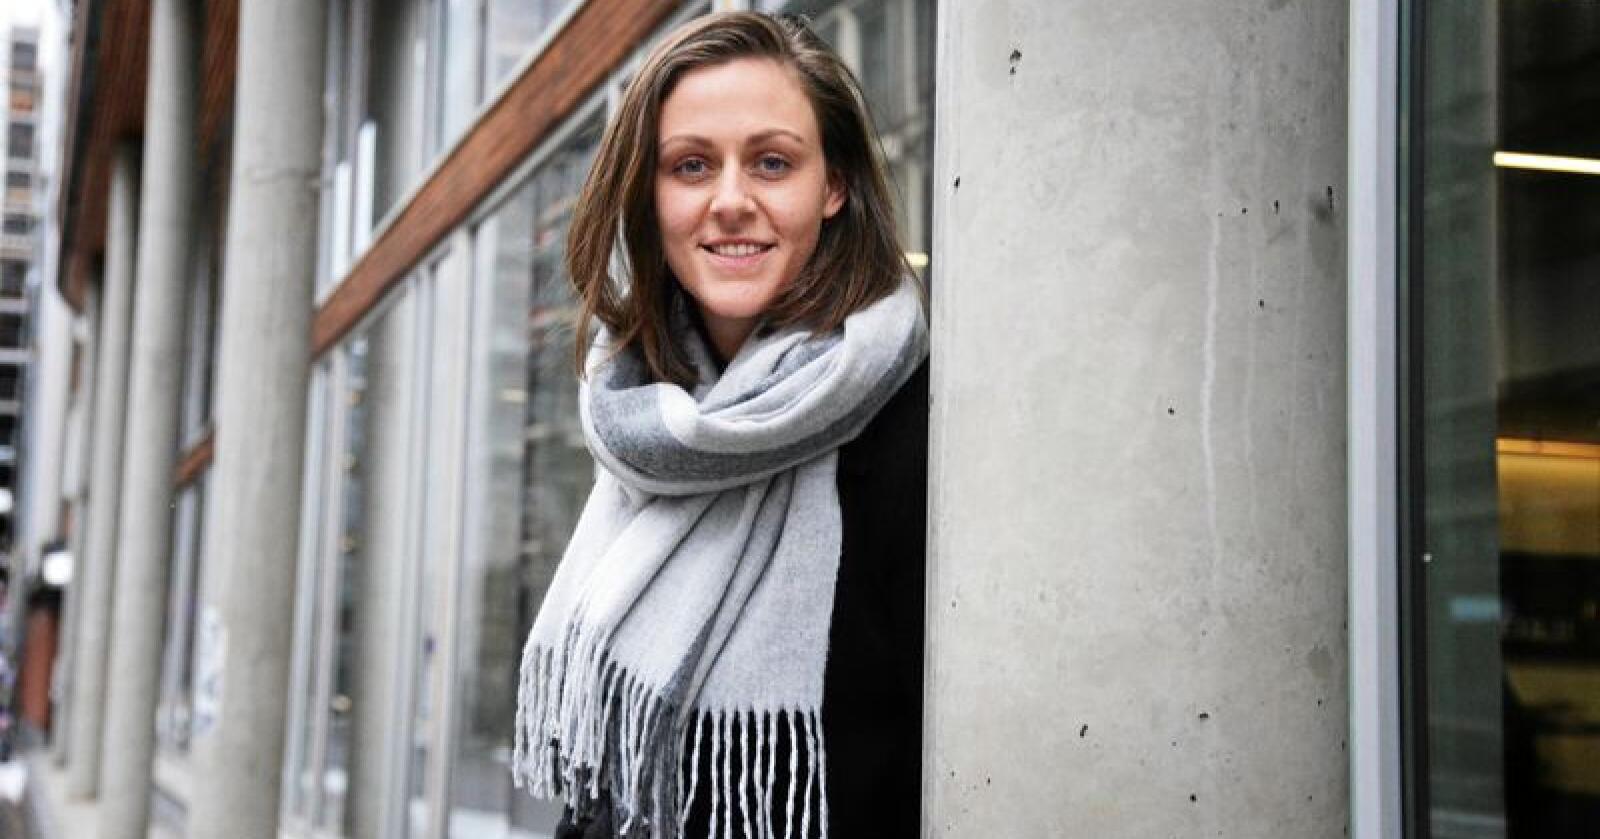 Tora Voll Dombu,  leder i Norges Bygdeungdomslag. Foto: Siri Juell Rasmussen